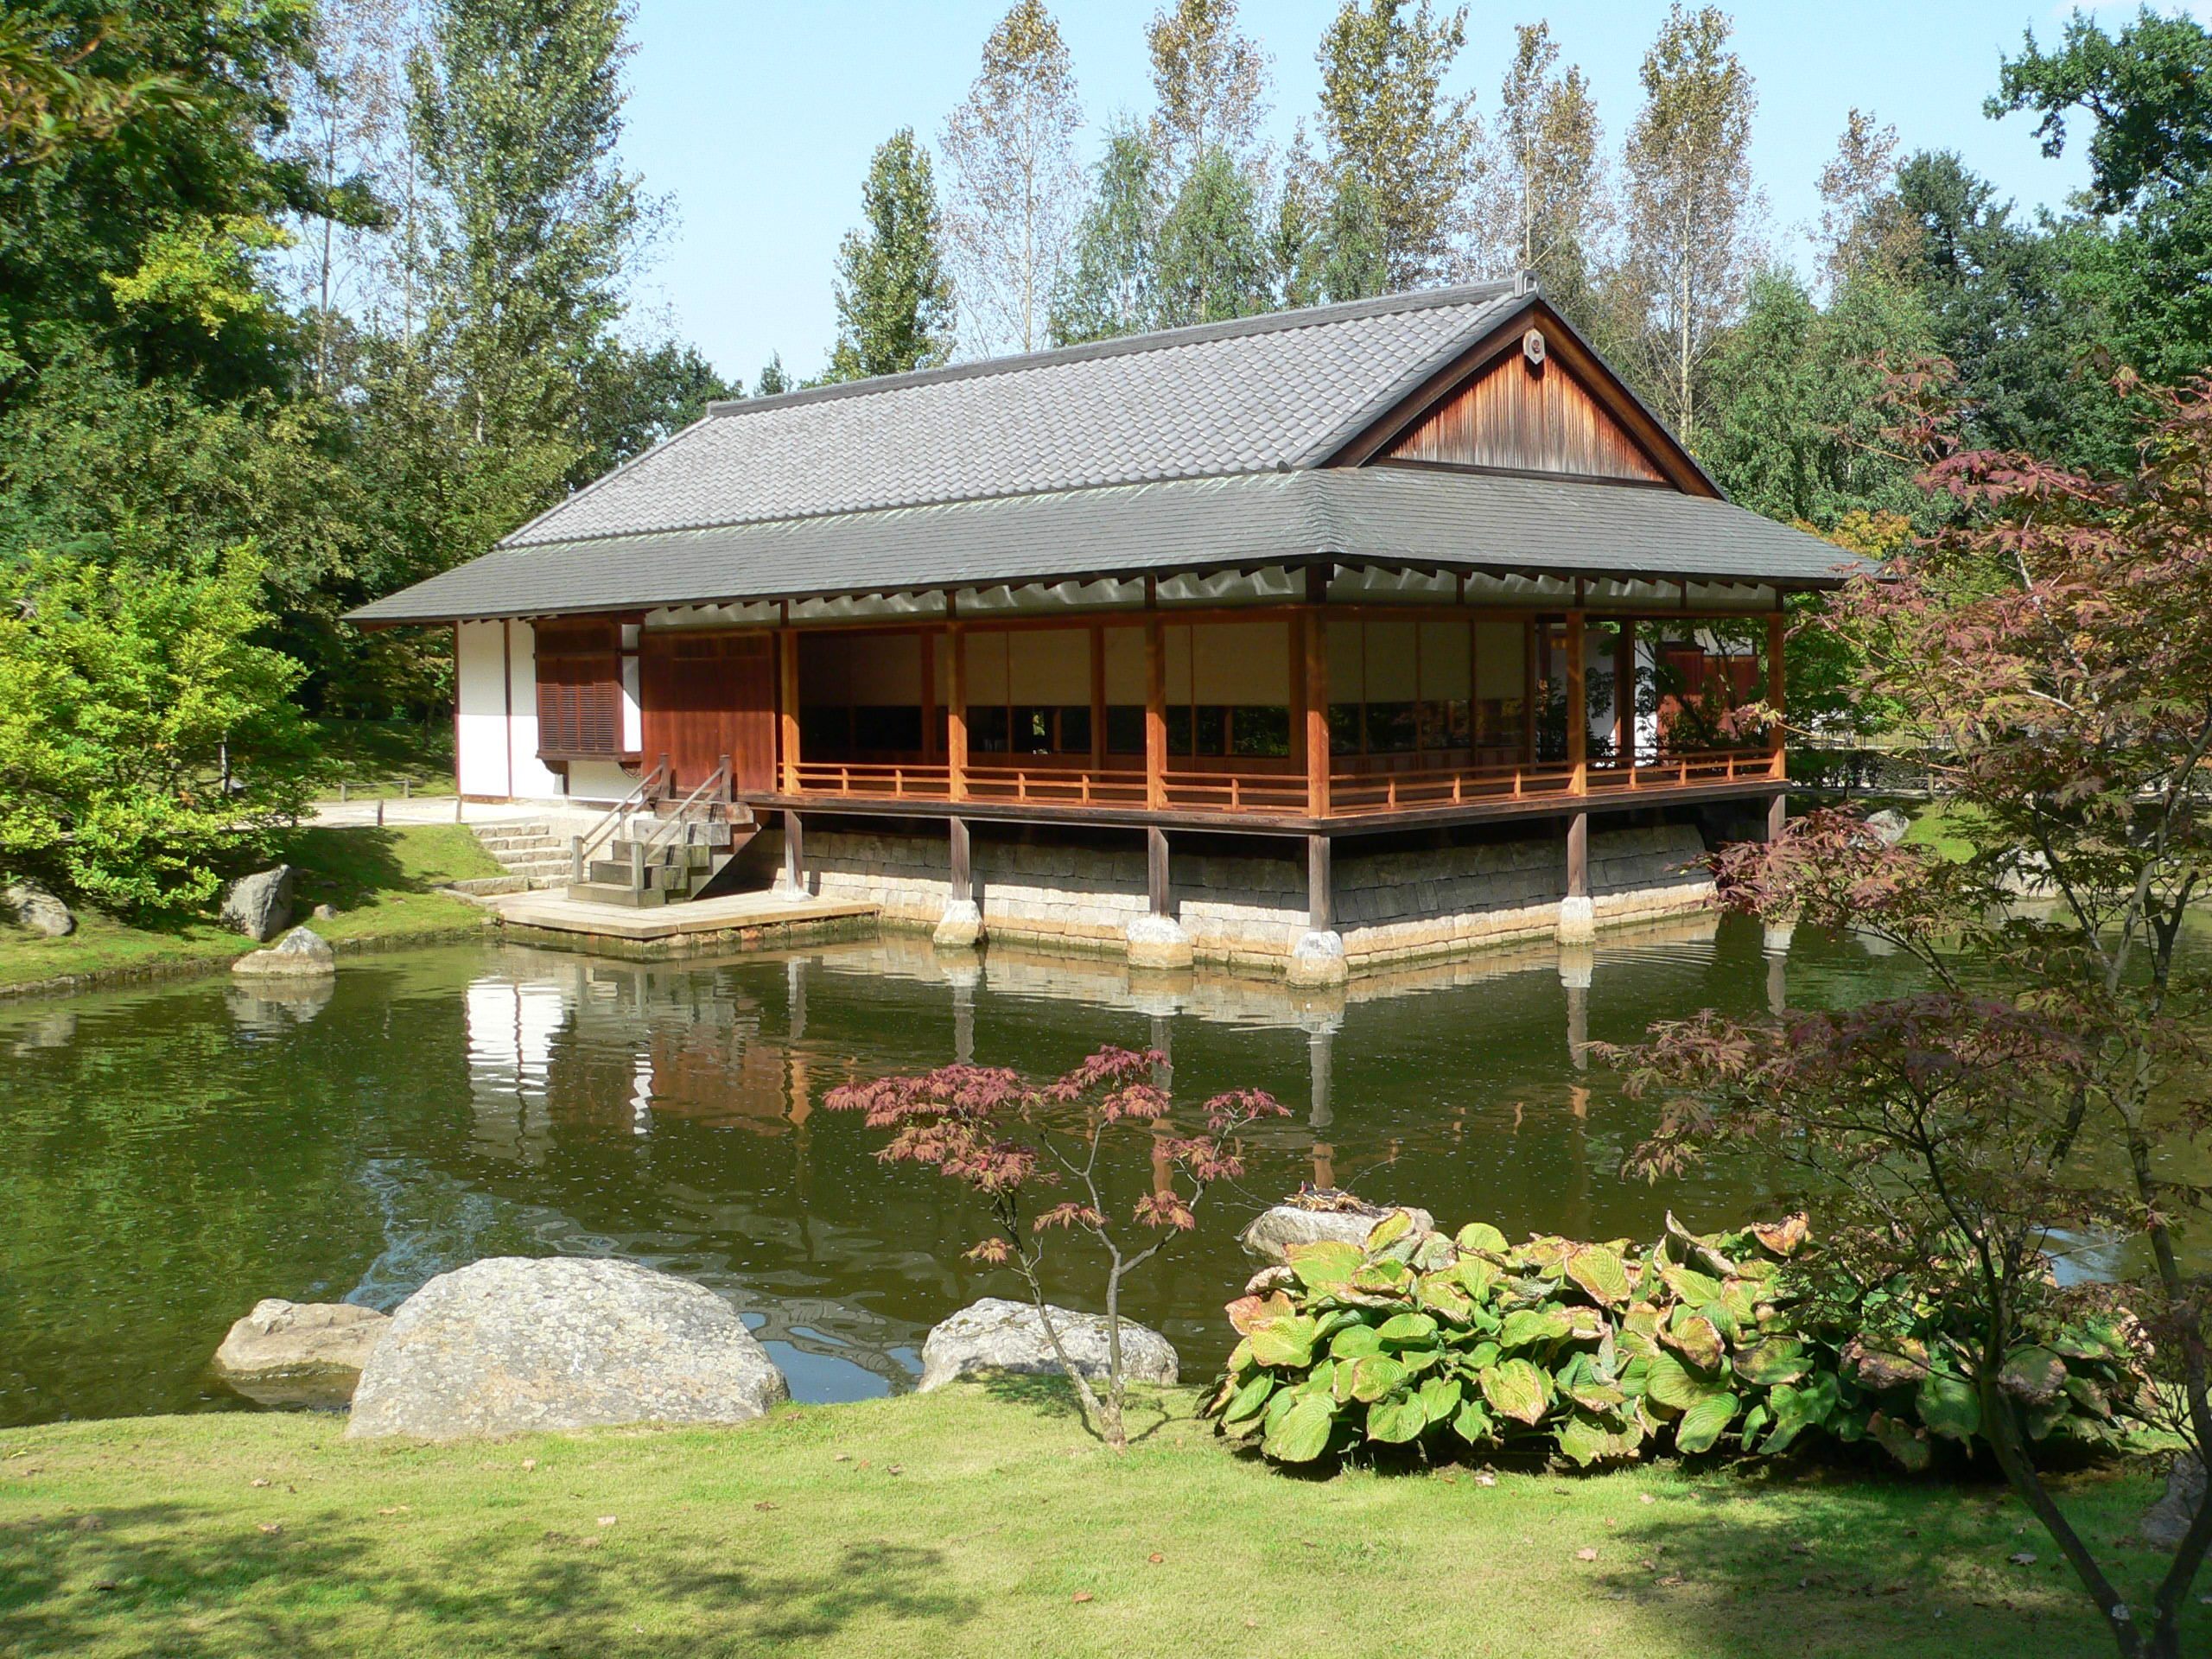 Datei Hasselt Japanischer Garten Teehaus 20060906 JPG – Wikipedia